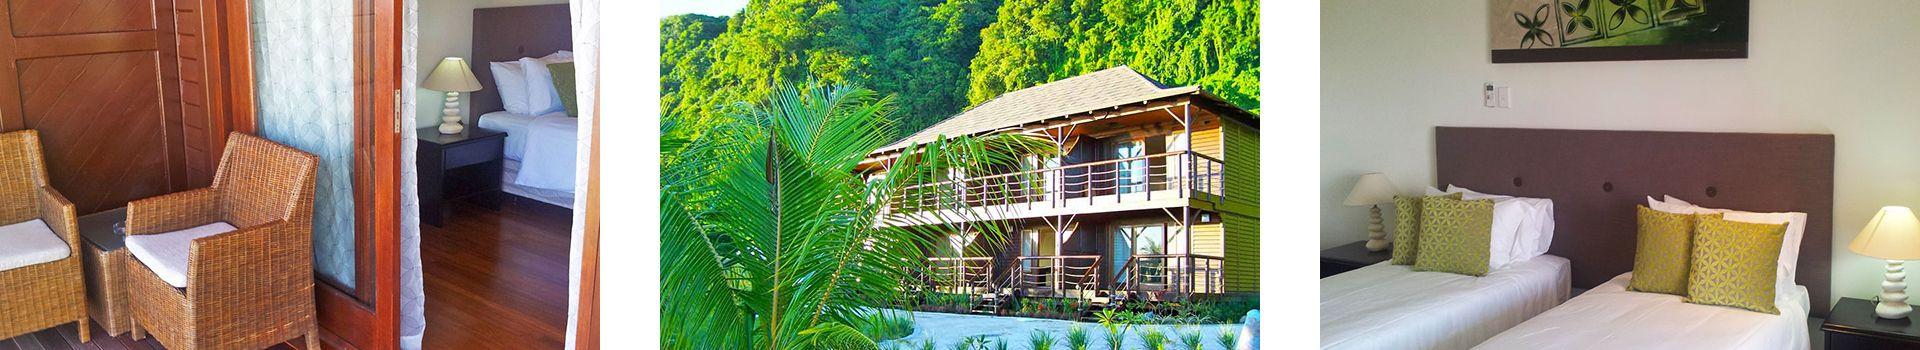 Hotel Room - Aga Reef Resort - Samoa